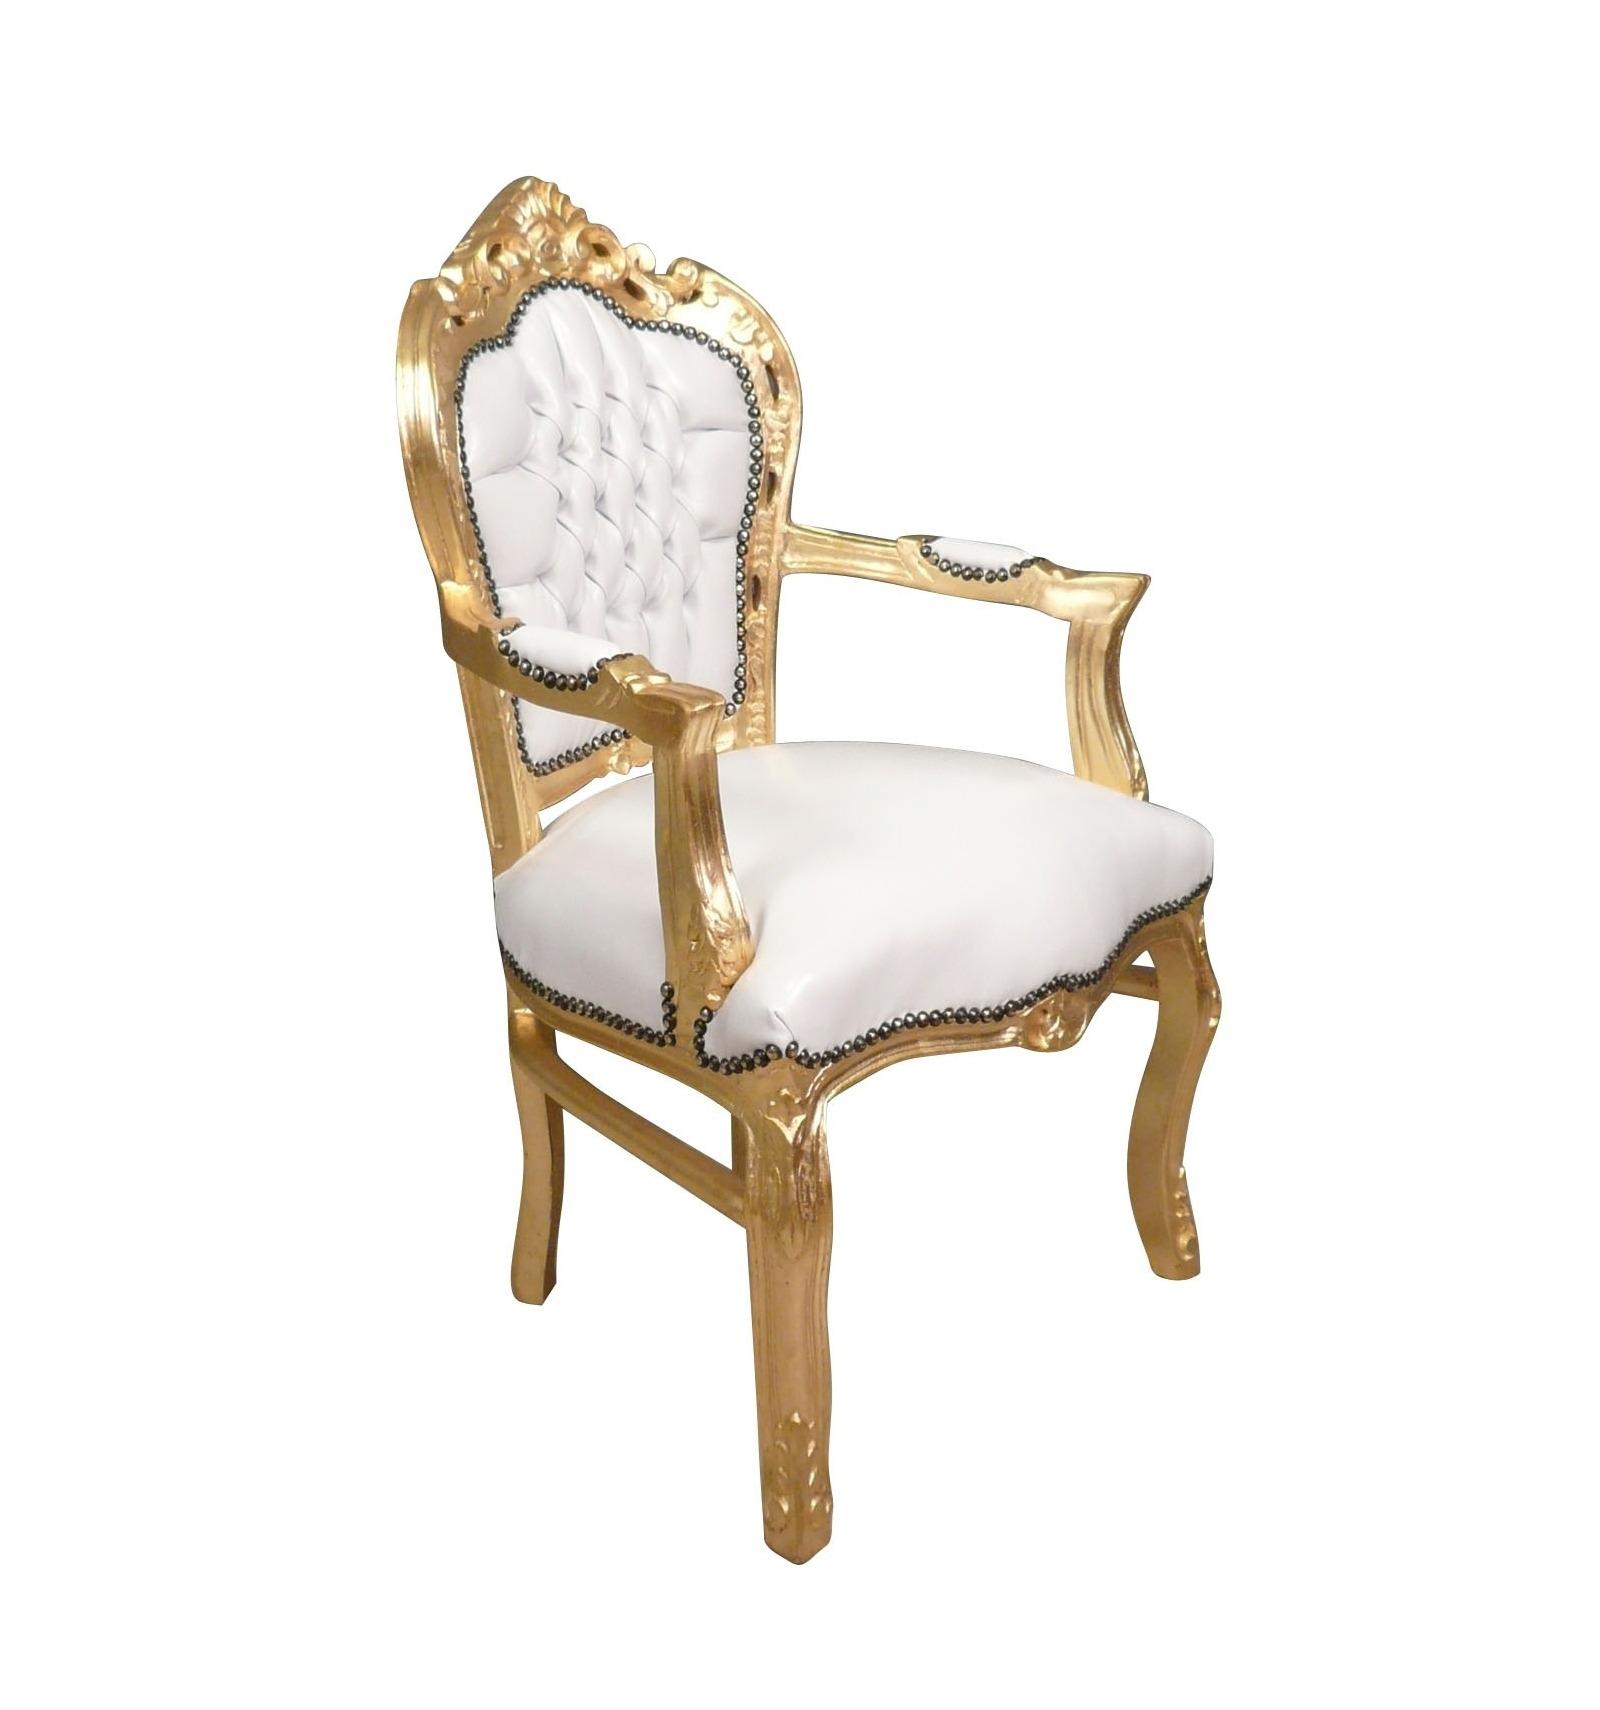 fauteuil baroque blanc et dor si ges rococo. Black Bedroom Furniture Sets. Home Design Ideas